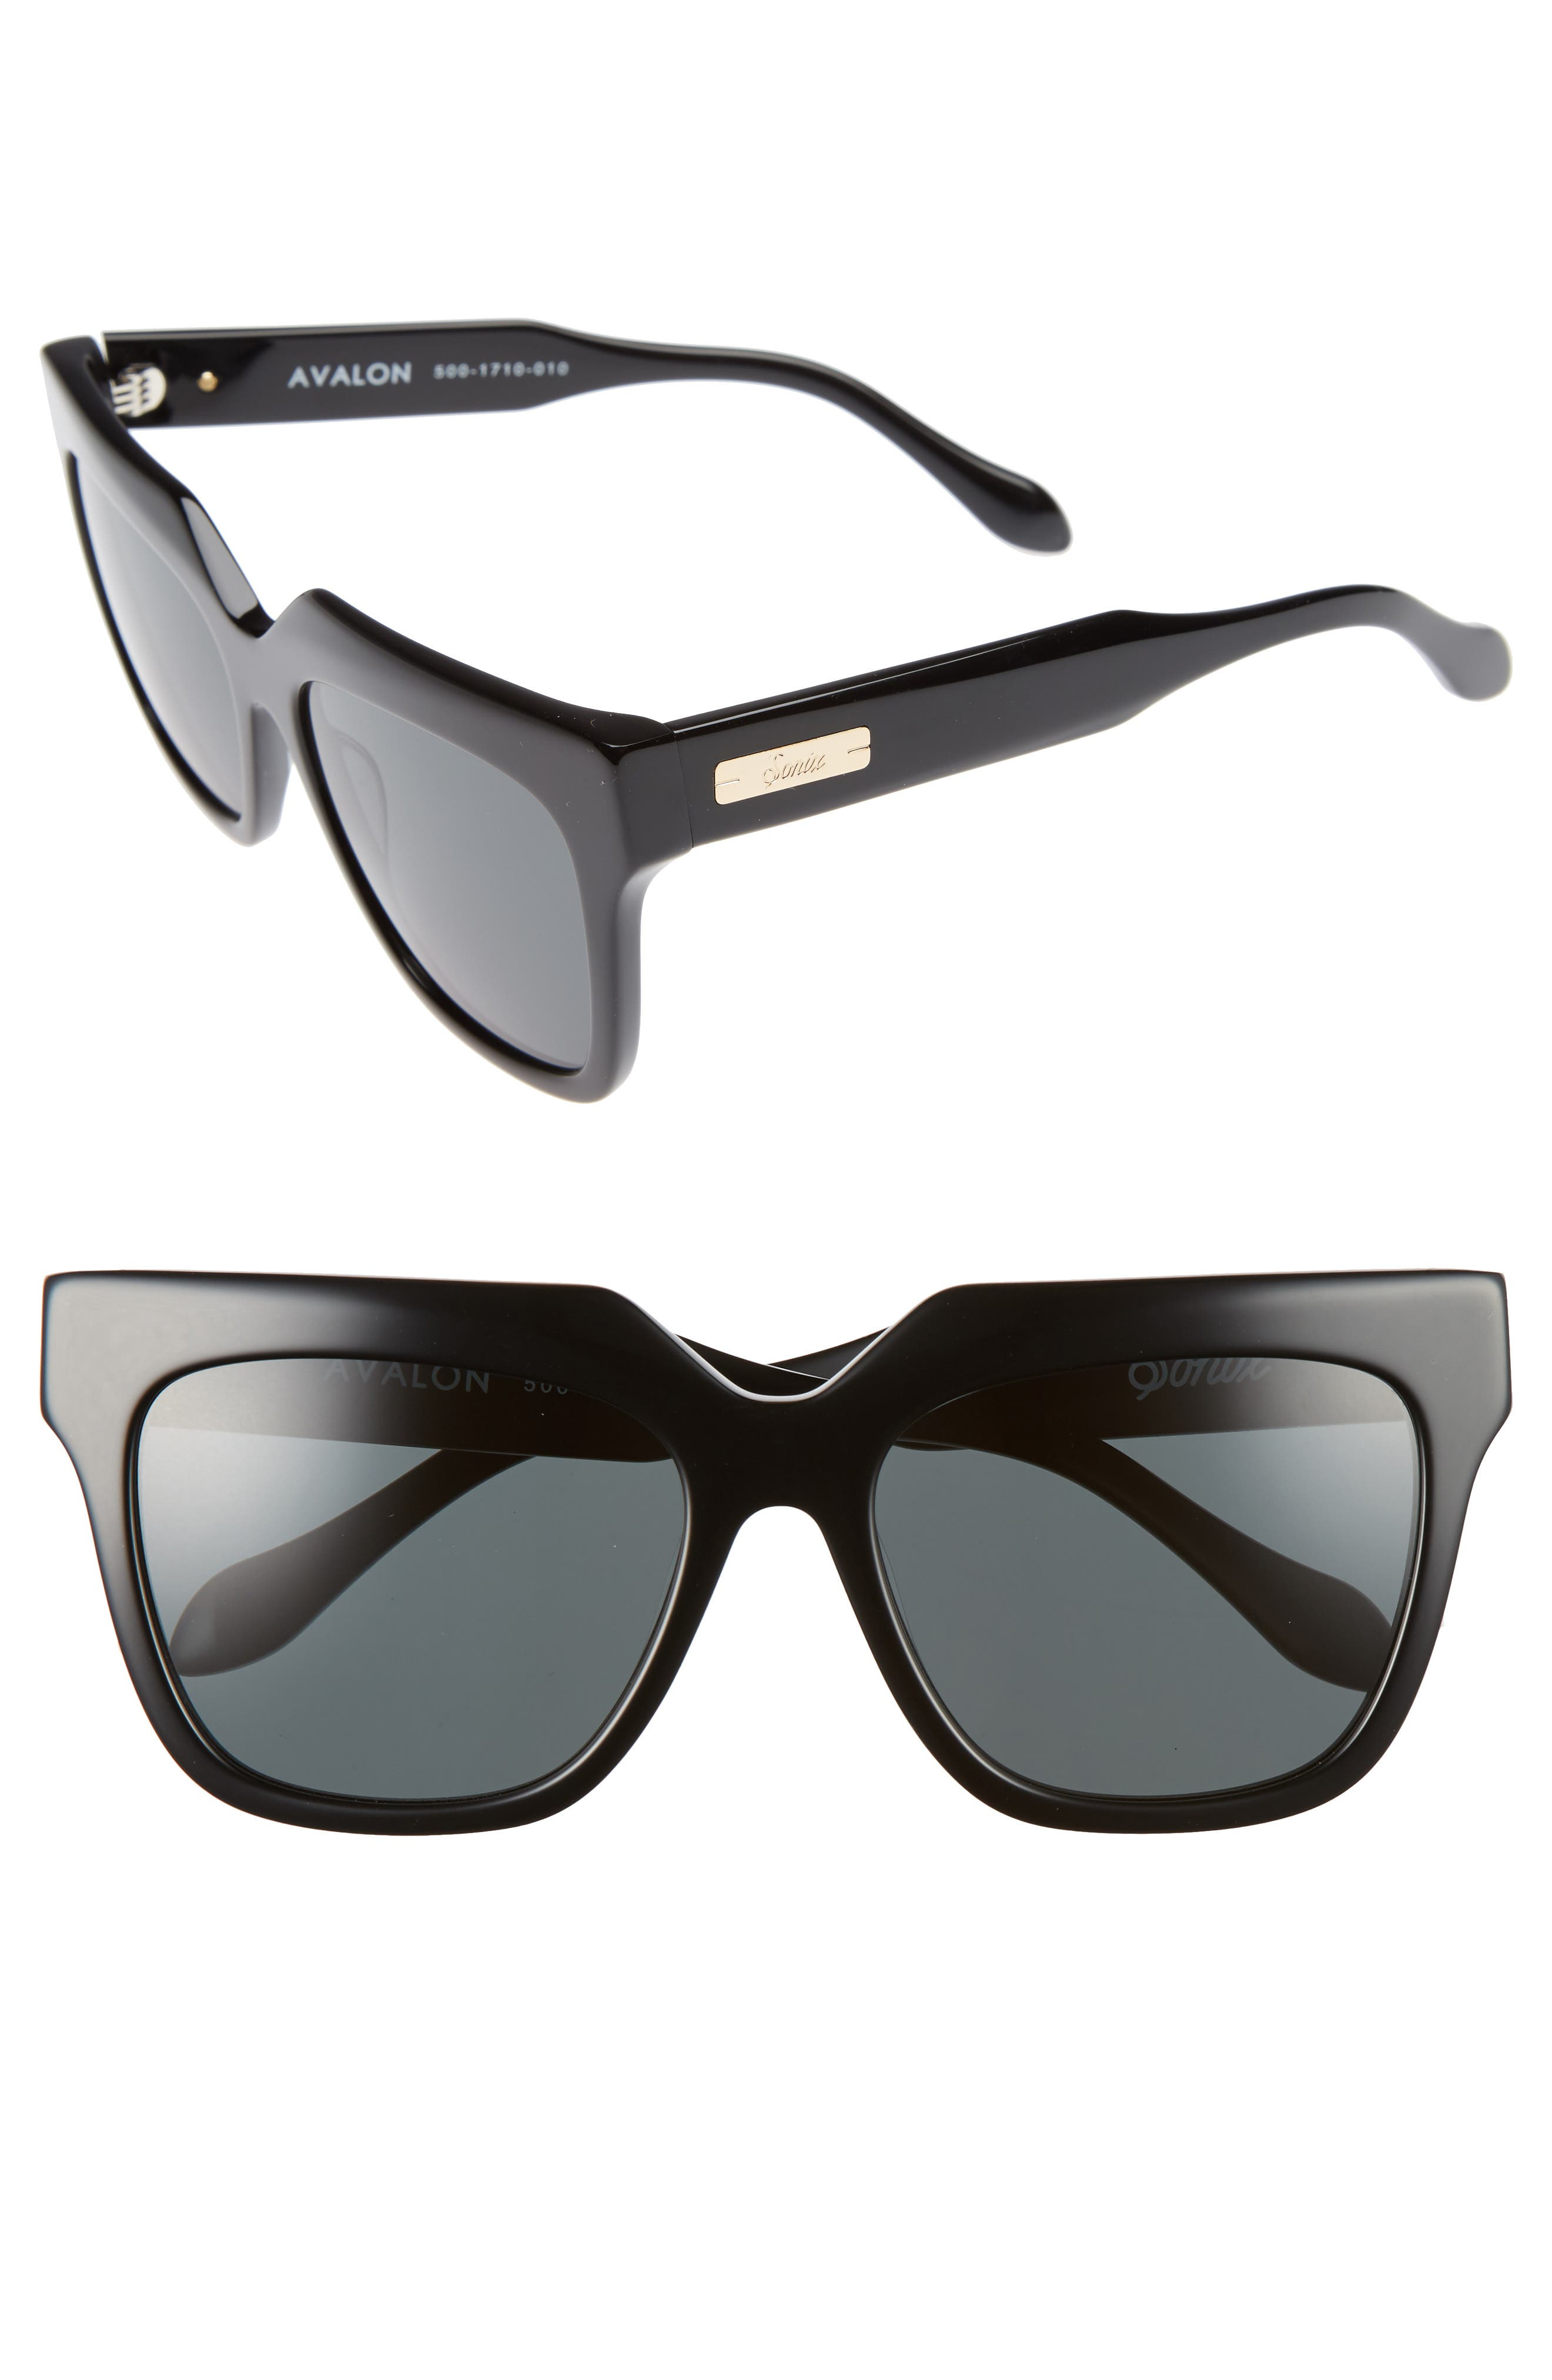 SONIX, Avalon 57mm Retro Sunglasses, Main thumbnail 1, color, 001